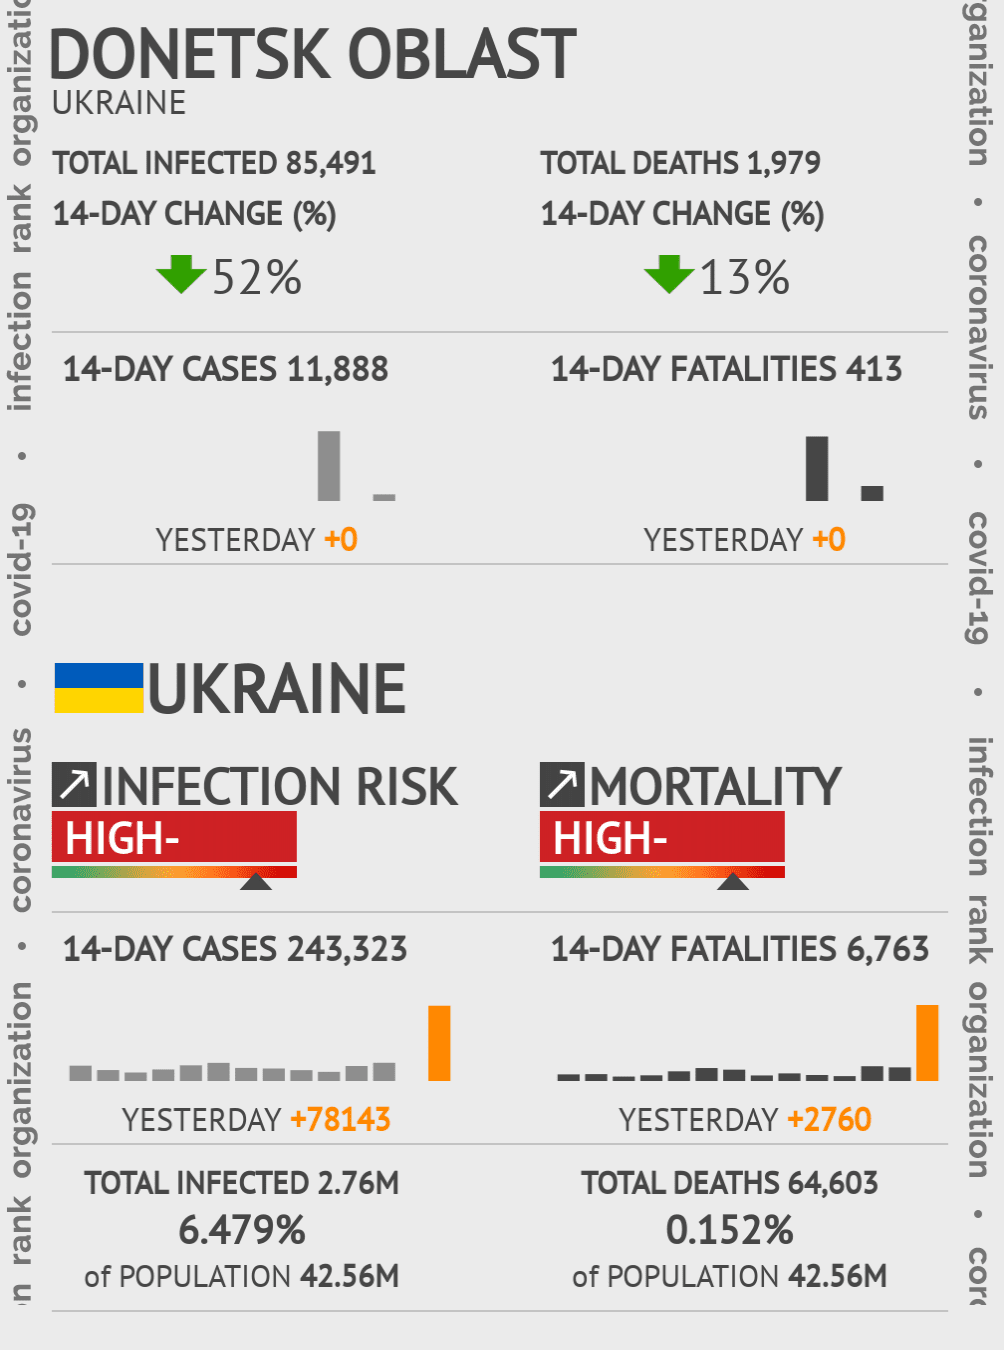 Donetsk Oblast Coronavirus Covid-19 Risk of Infection on March 03, 2021